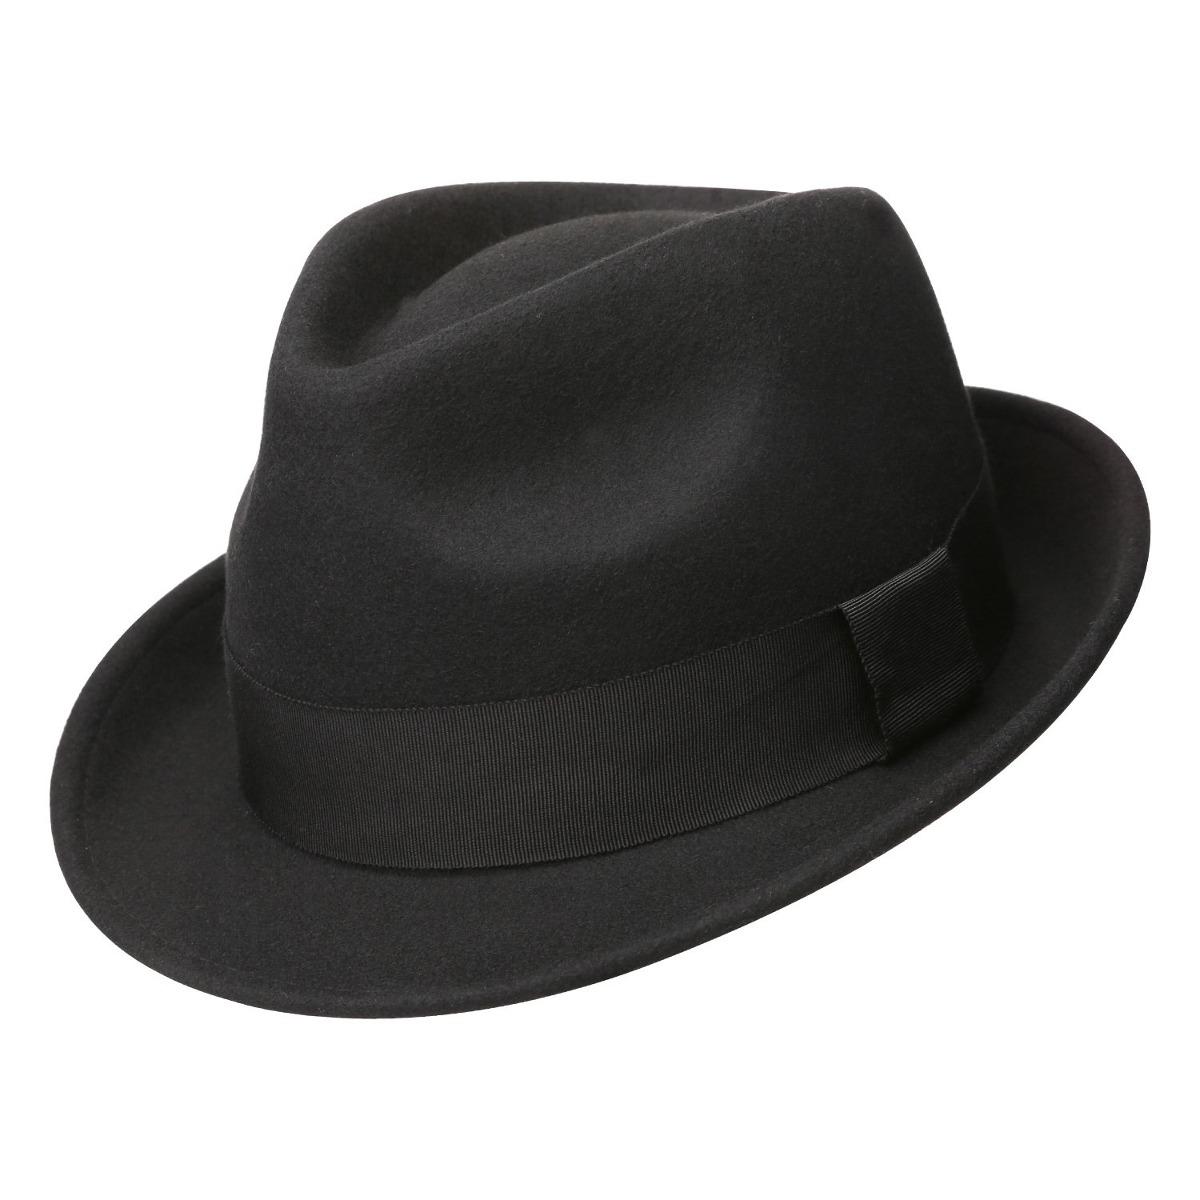 sedancasesa sombrero fedora fedora para hombre sombreros. Cargando zoom. 354f0763913